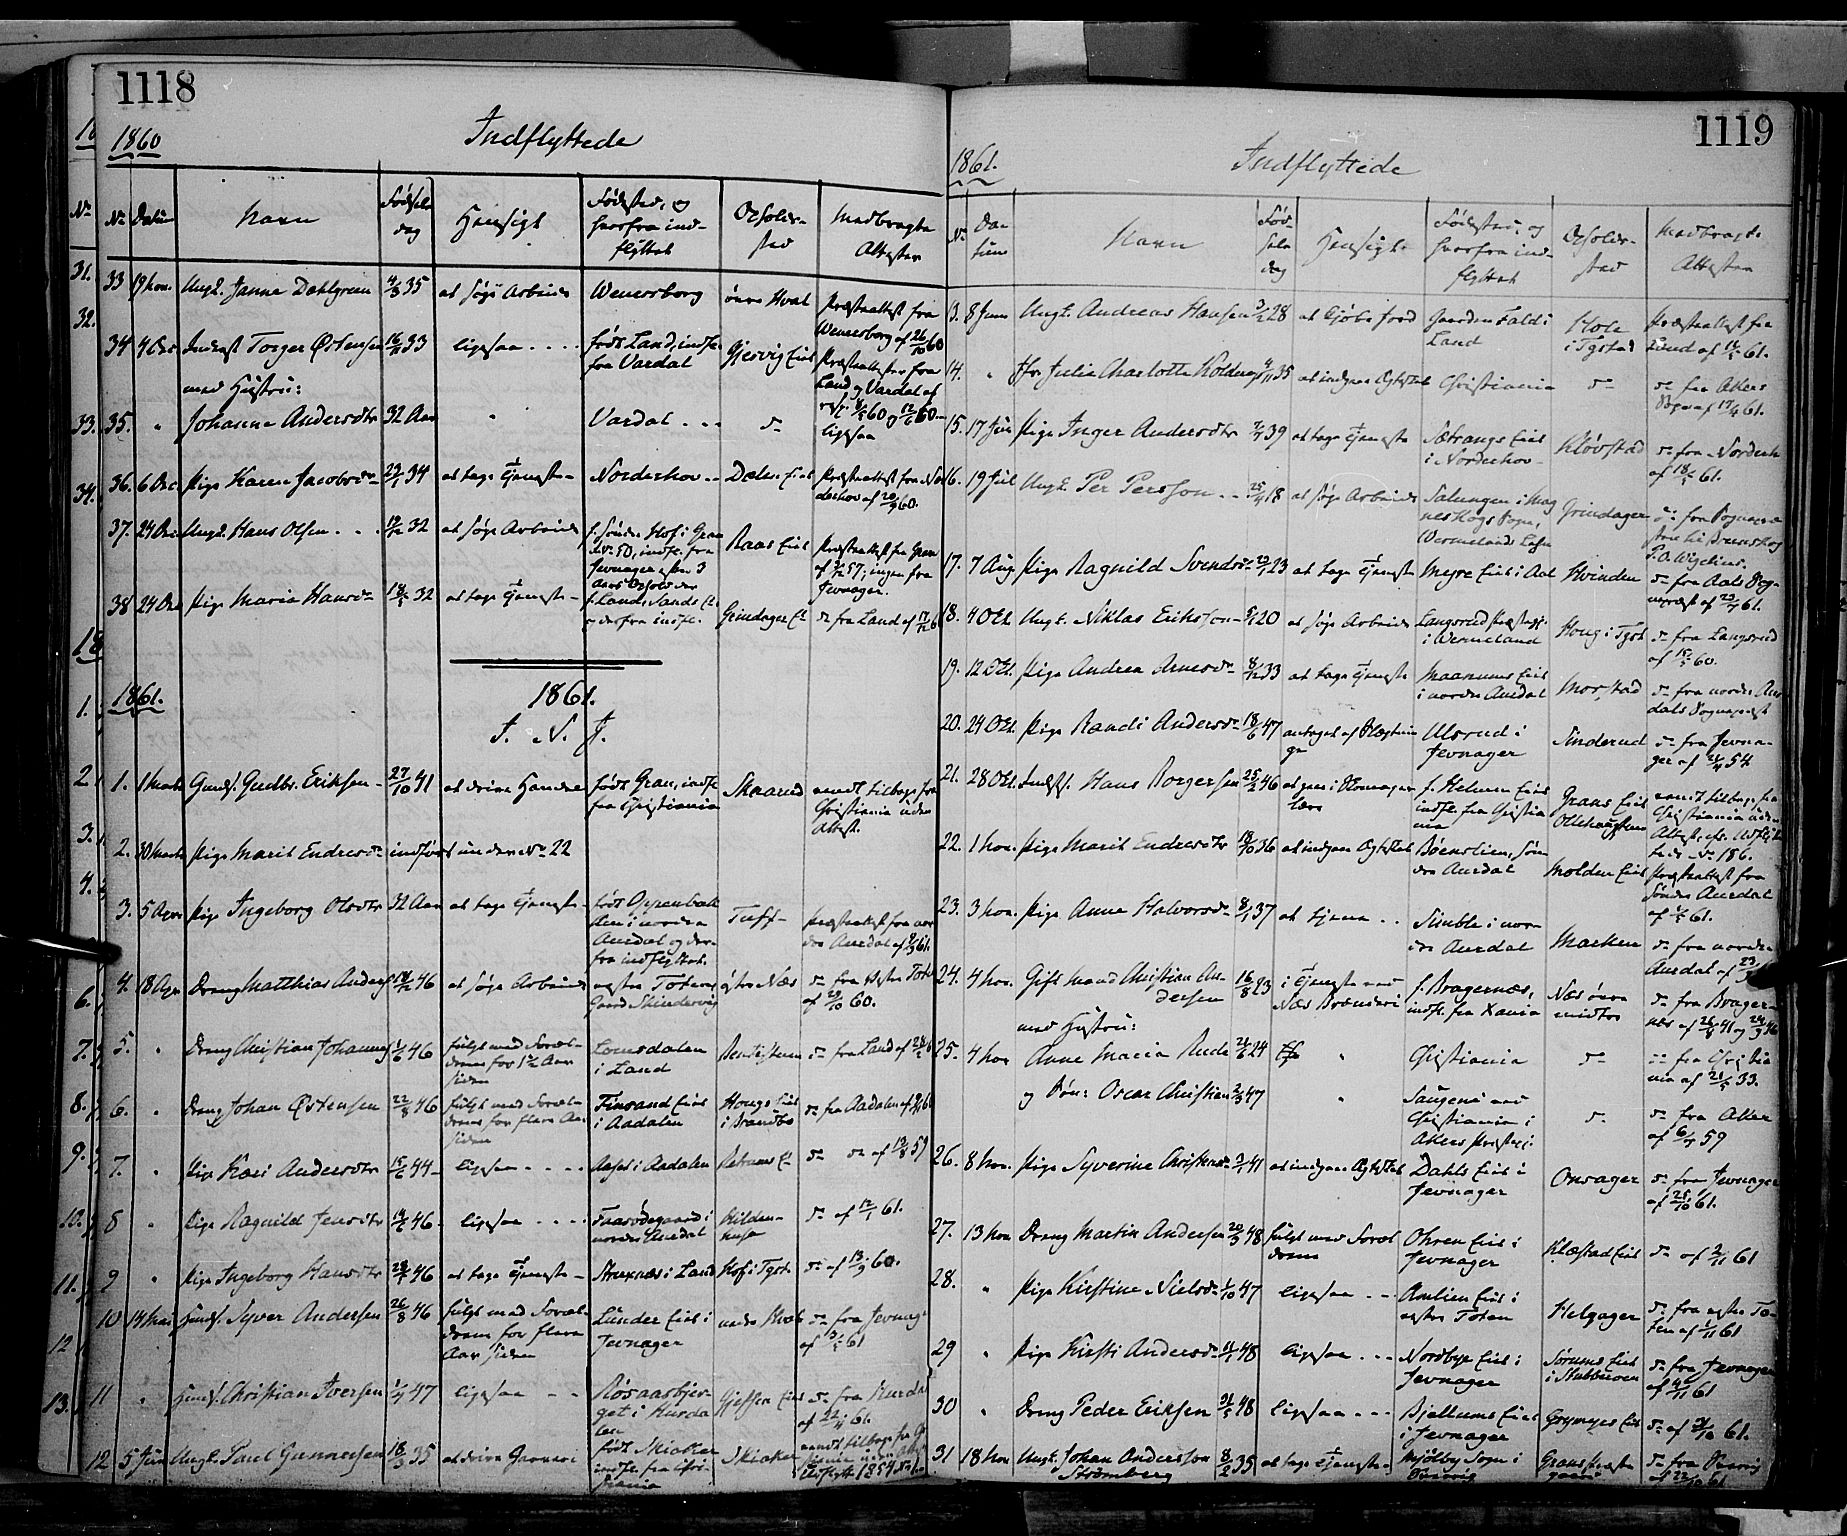 SAH, Gran prestekontor, Ministerialbok nr. 12, 1856-1874, s. 1118-1119